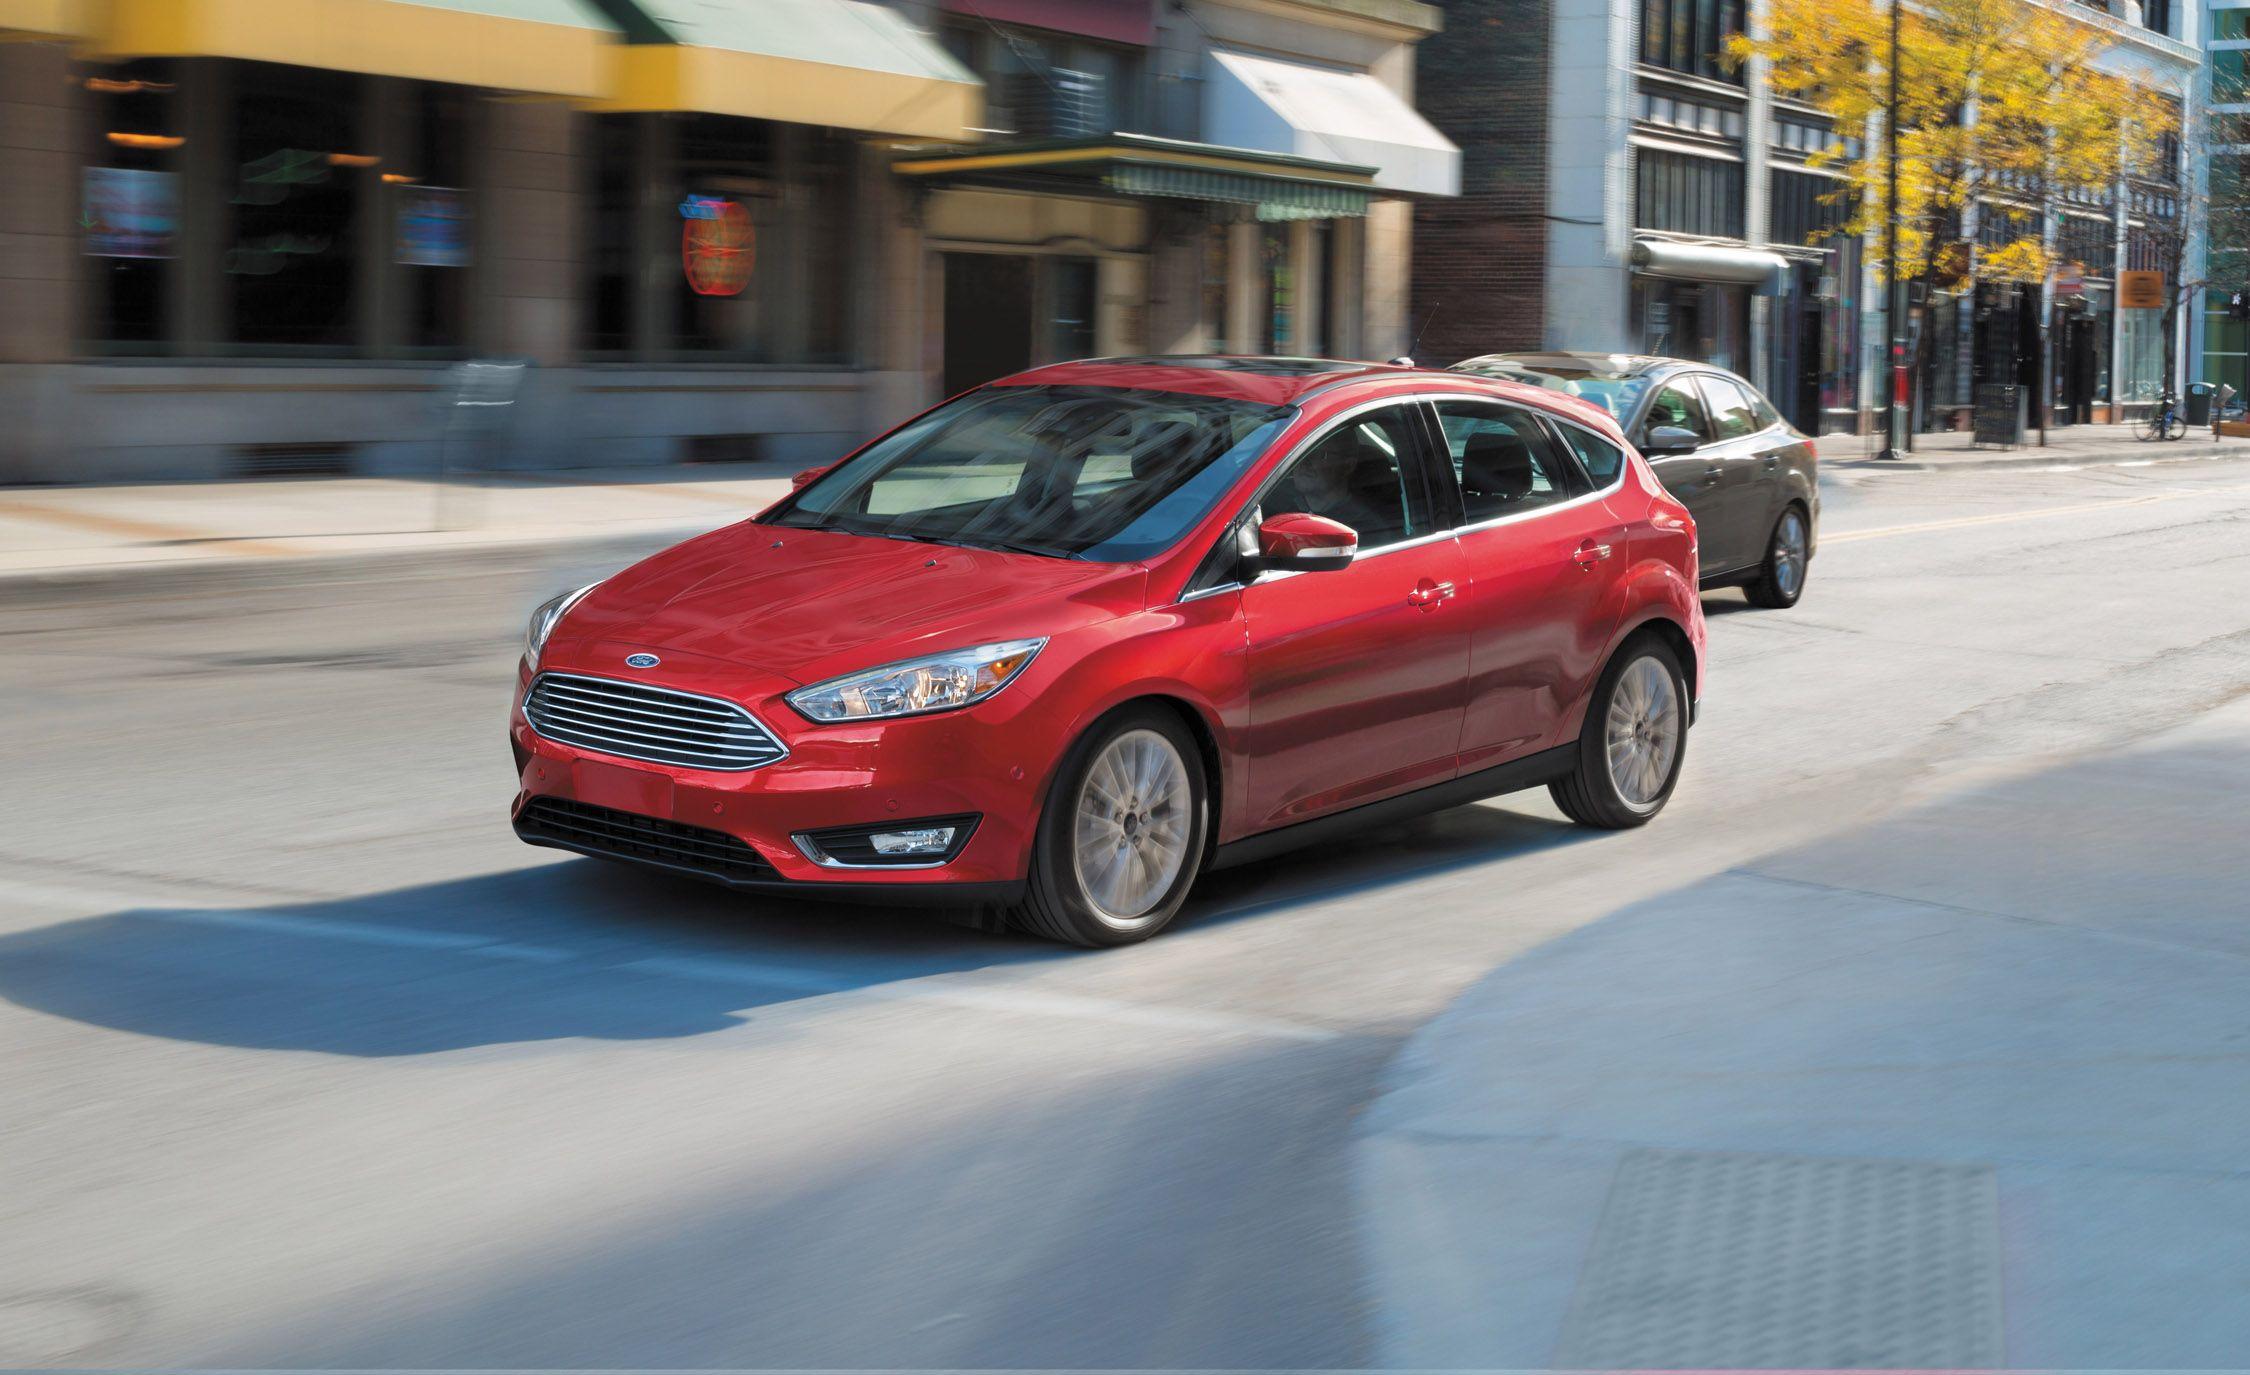 Ford Focus Reviews Price Photos And Specs Car 2014 Antenna 2018